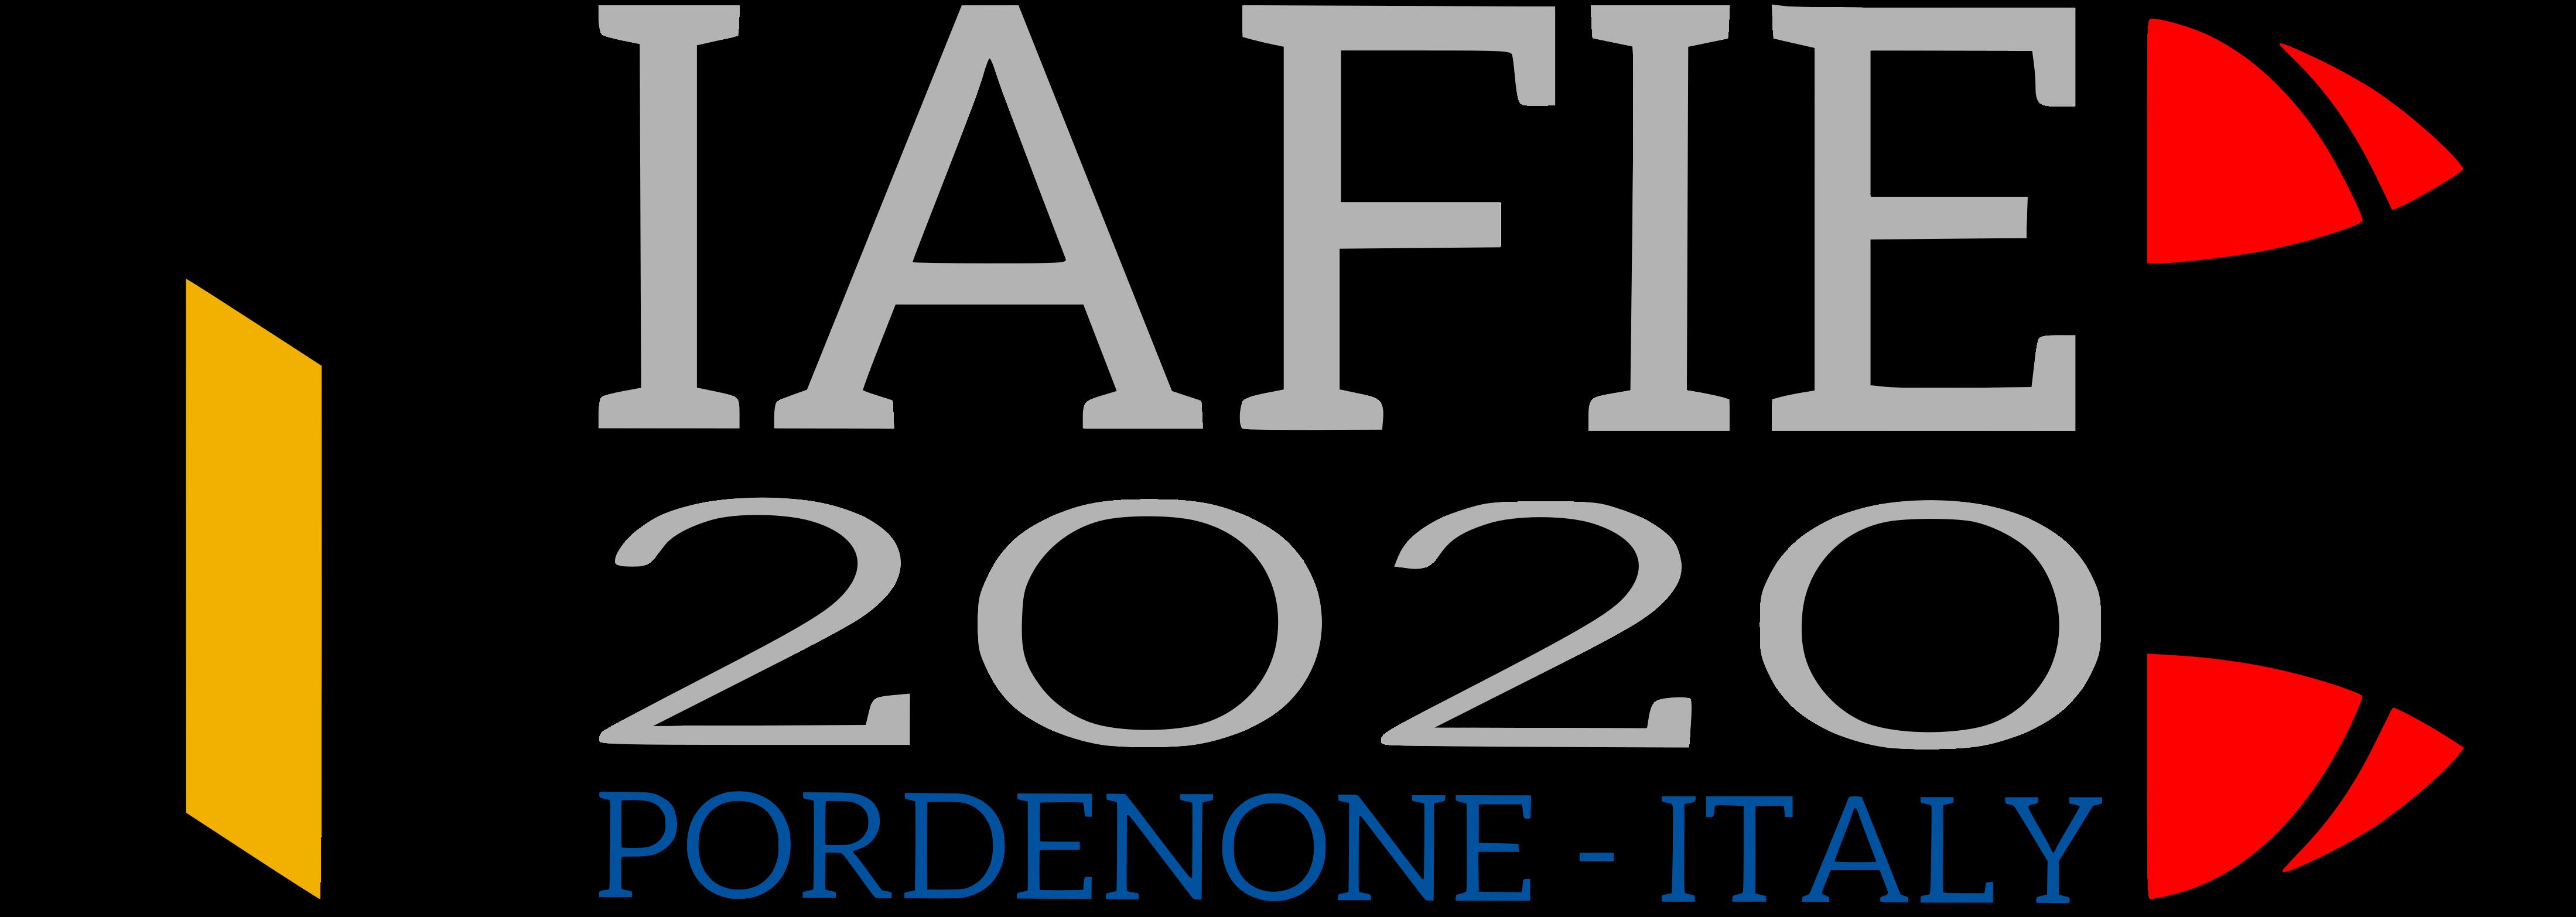 iafie_2020_conference_logo